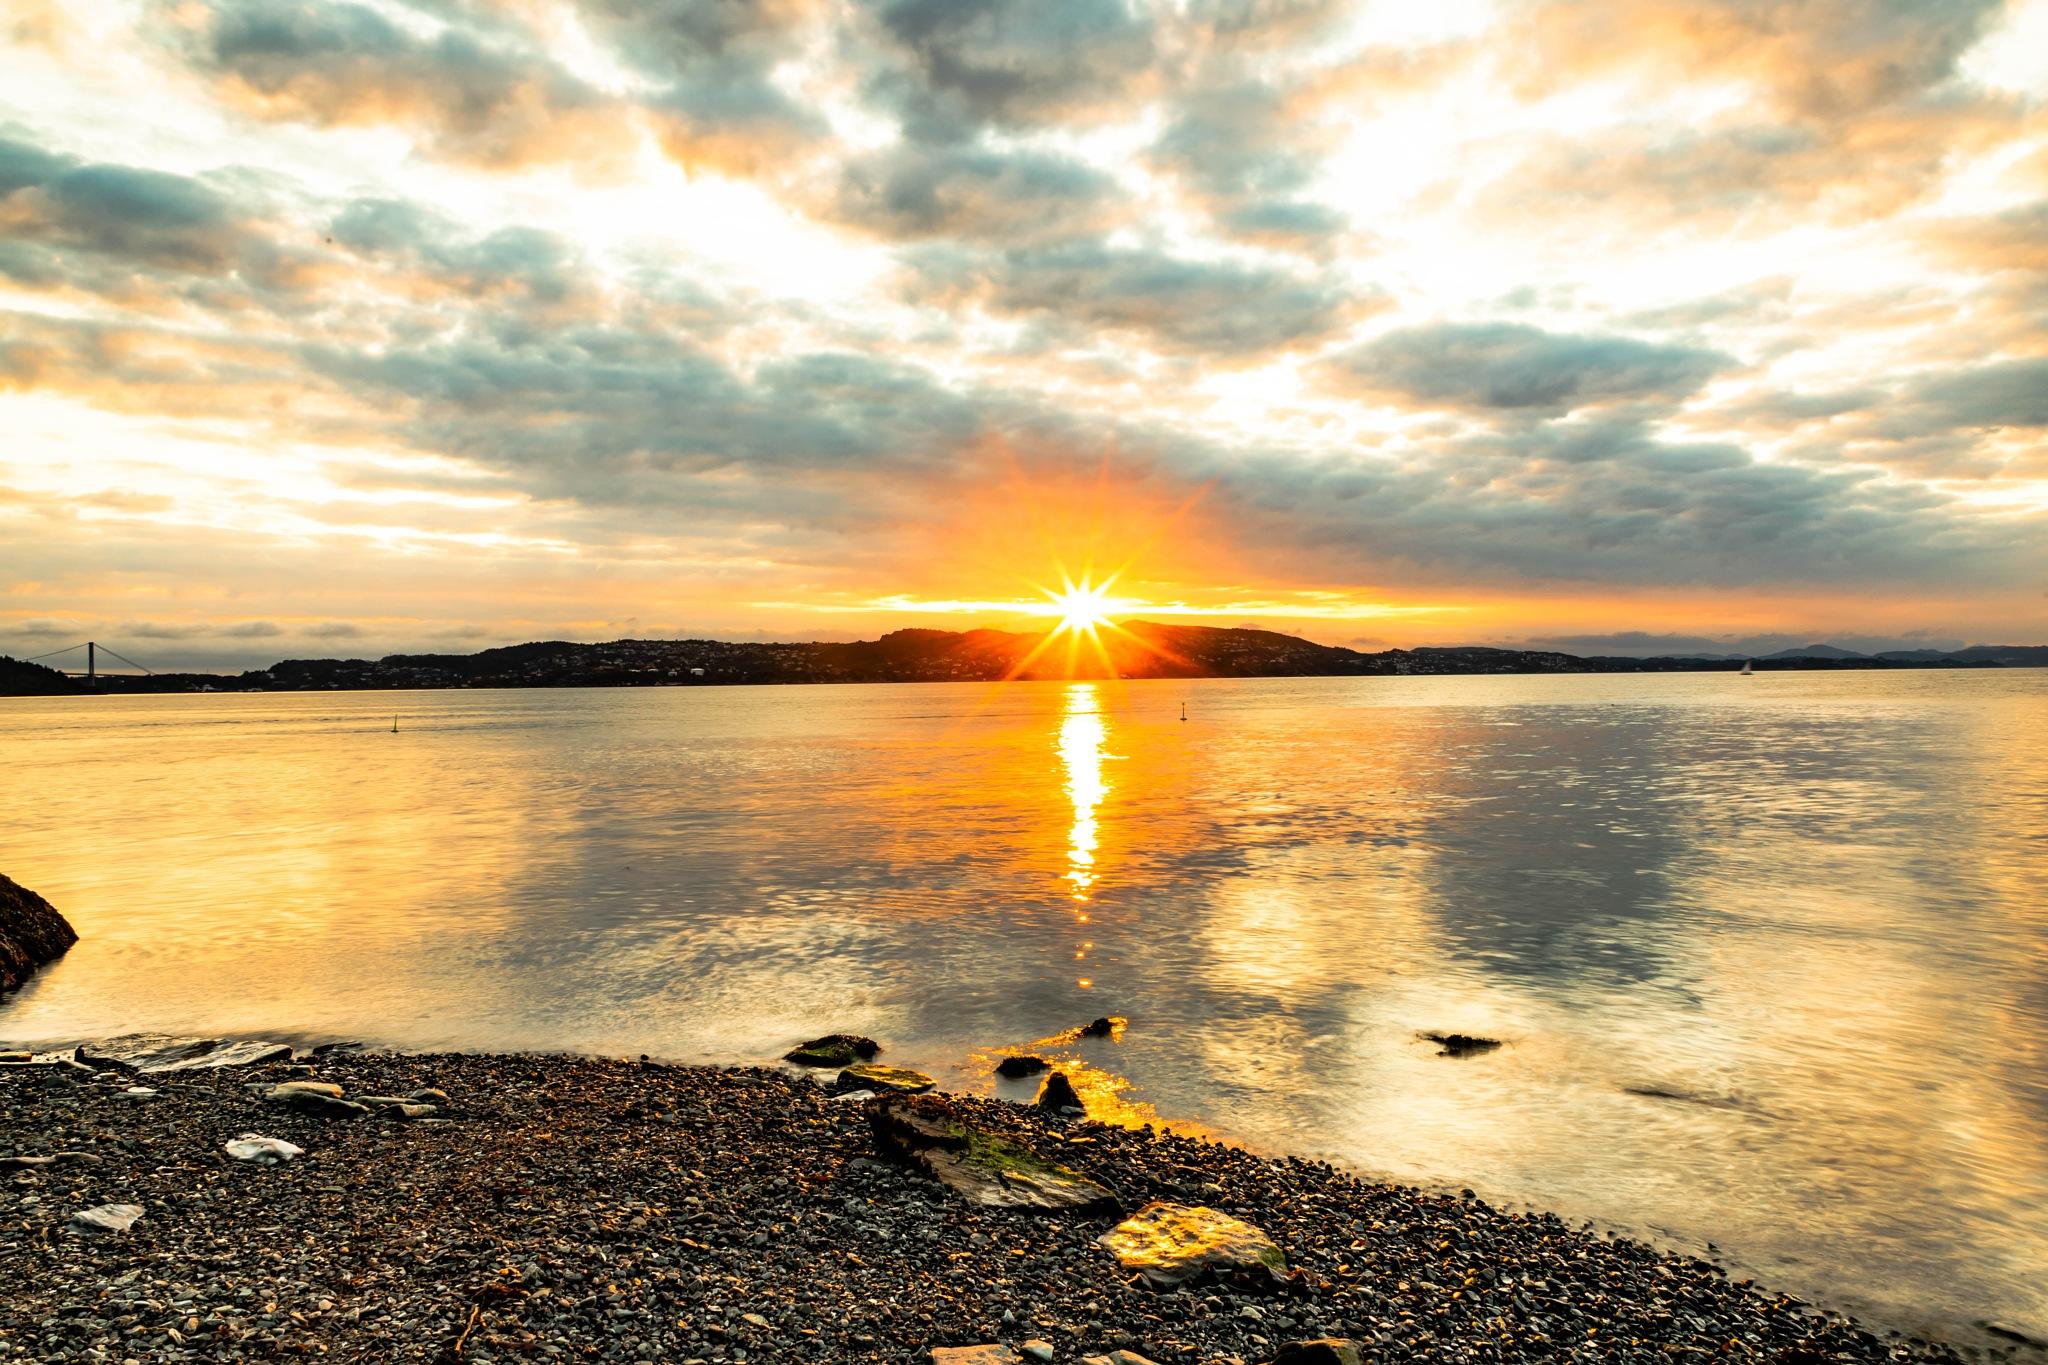 Sunset over the island by Svein Erik Andresen